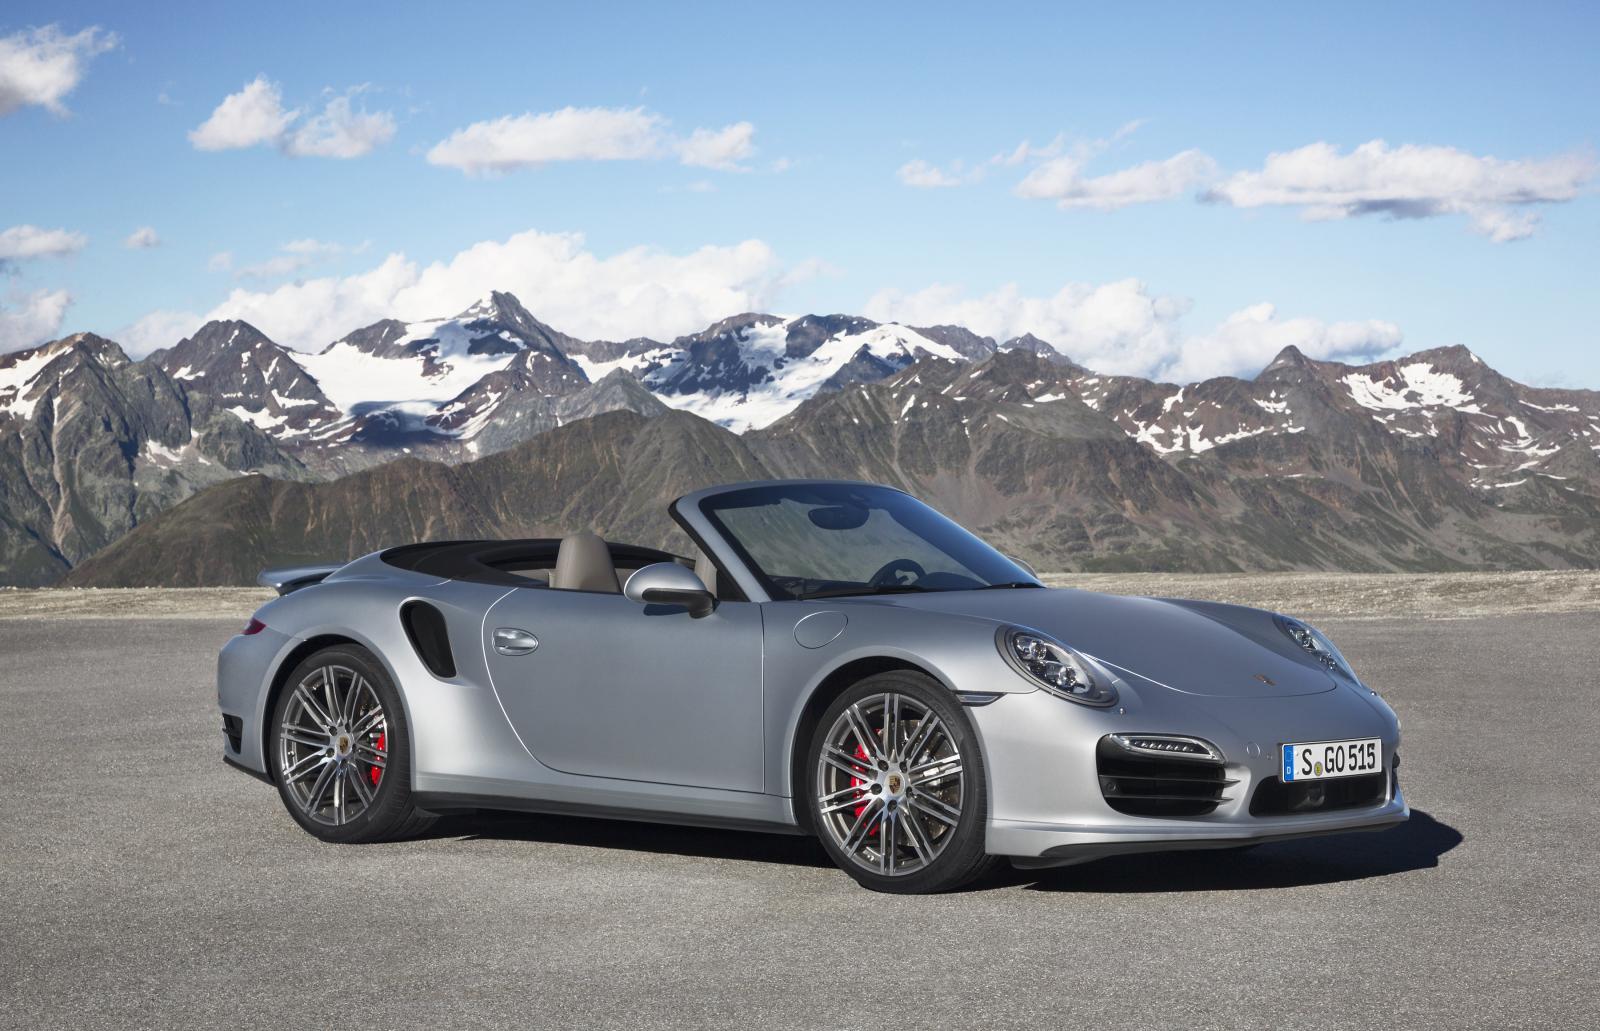 2014 porsche 911 turbo turbo s cabriolet revealed autoevolution. Black Bedroom Furniture Sets. Home Design Ideas